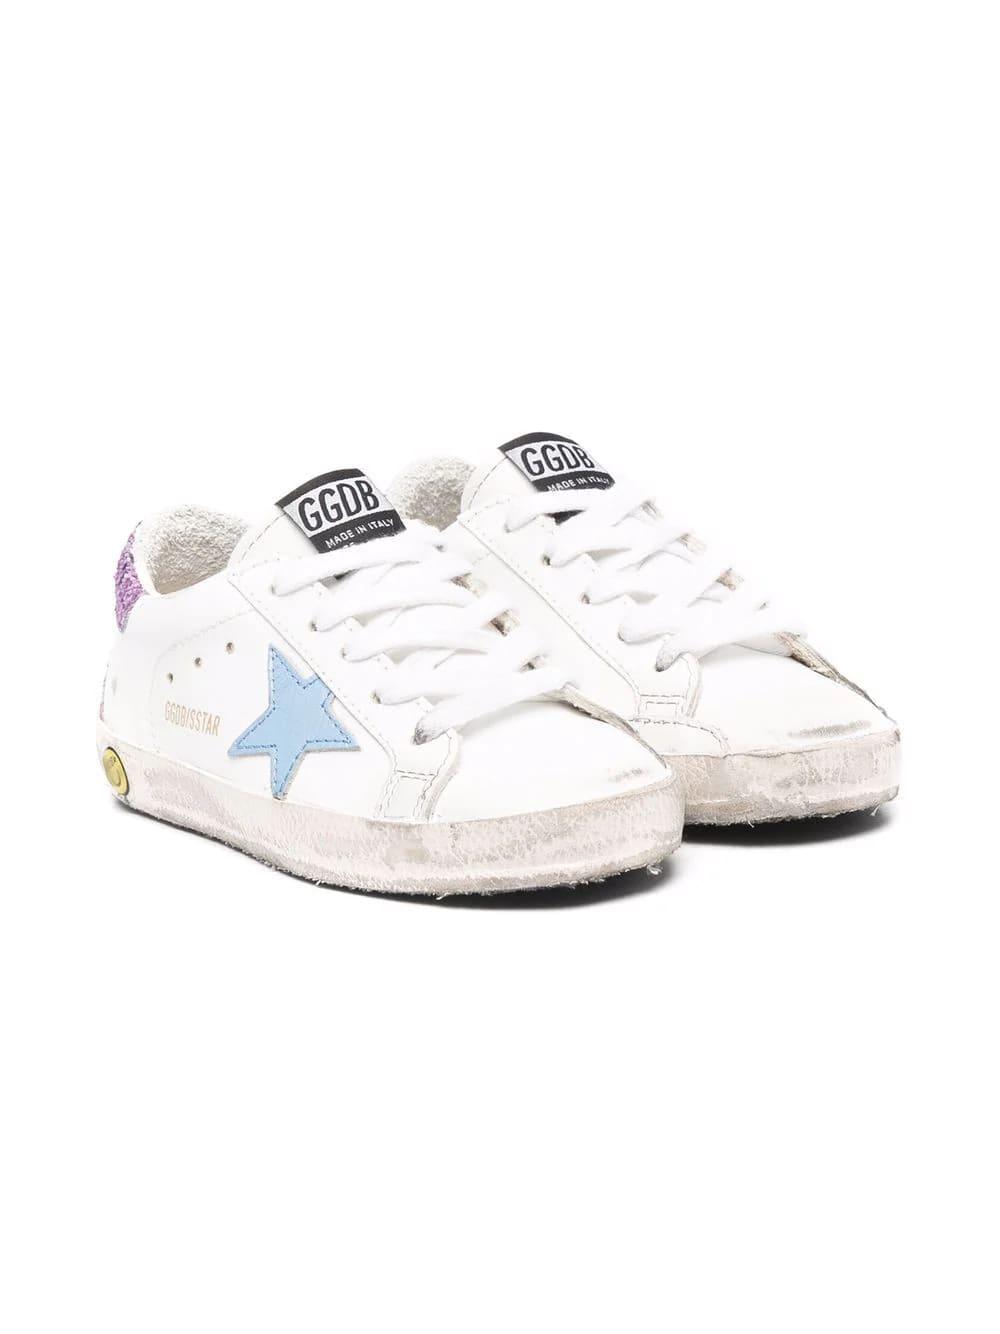 Golden Goose Kids White Super-star Sneakers With Light Blue Star And Purple Glitter Spoiler